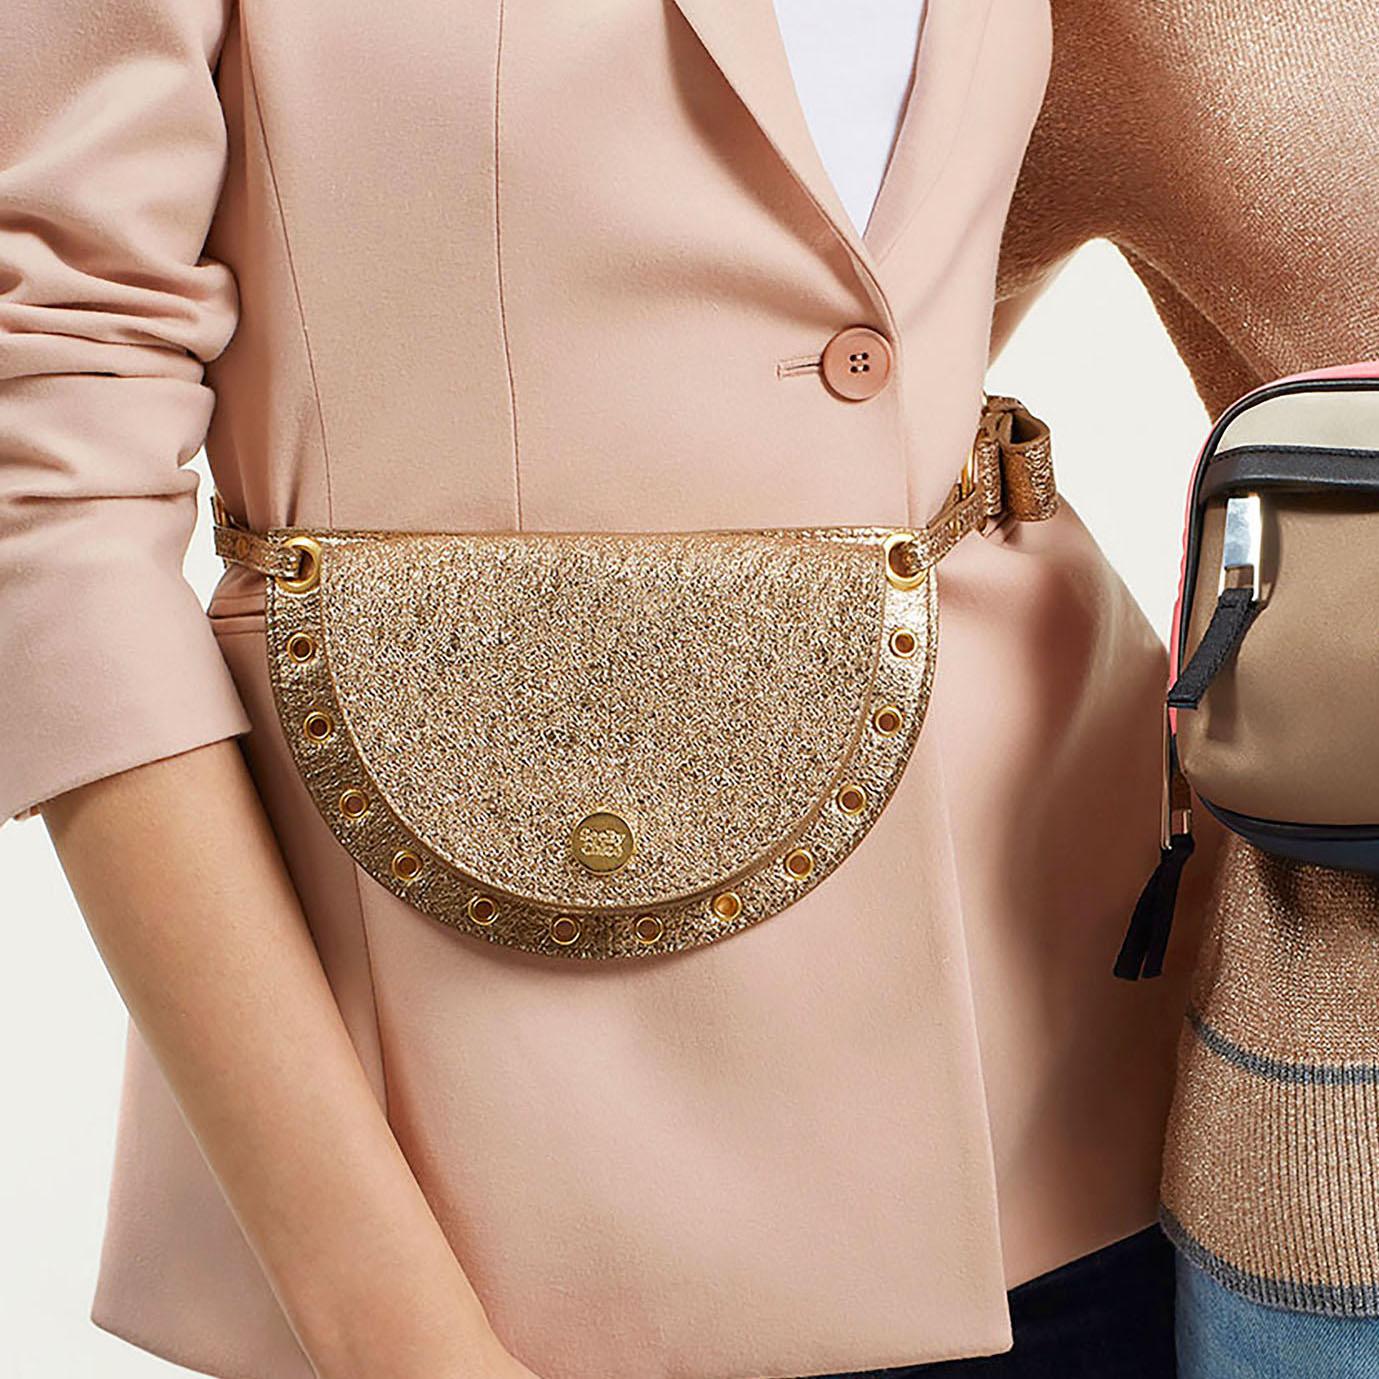 fanny pack chloe kriss convertible leather belt bag